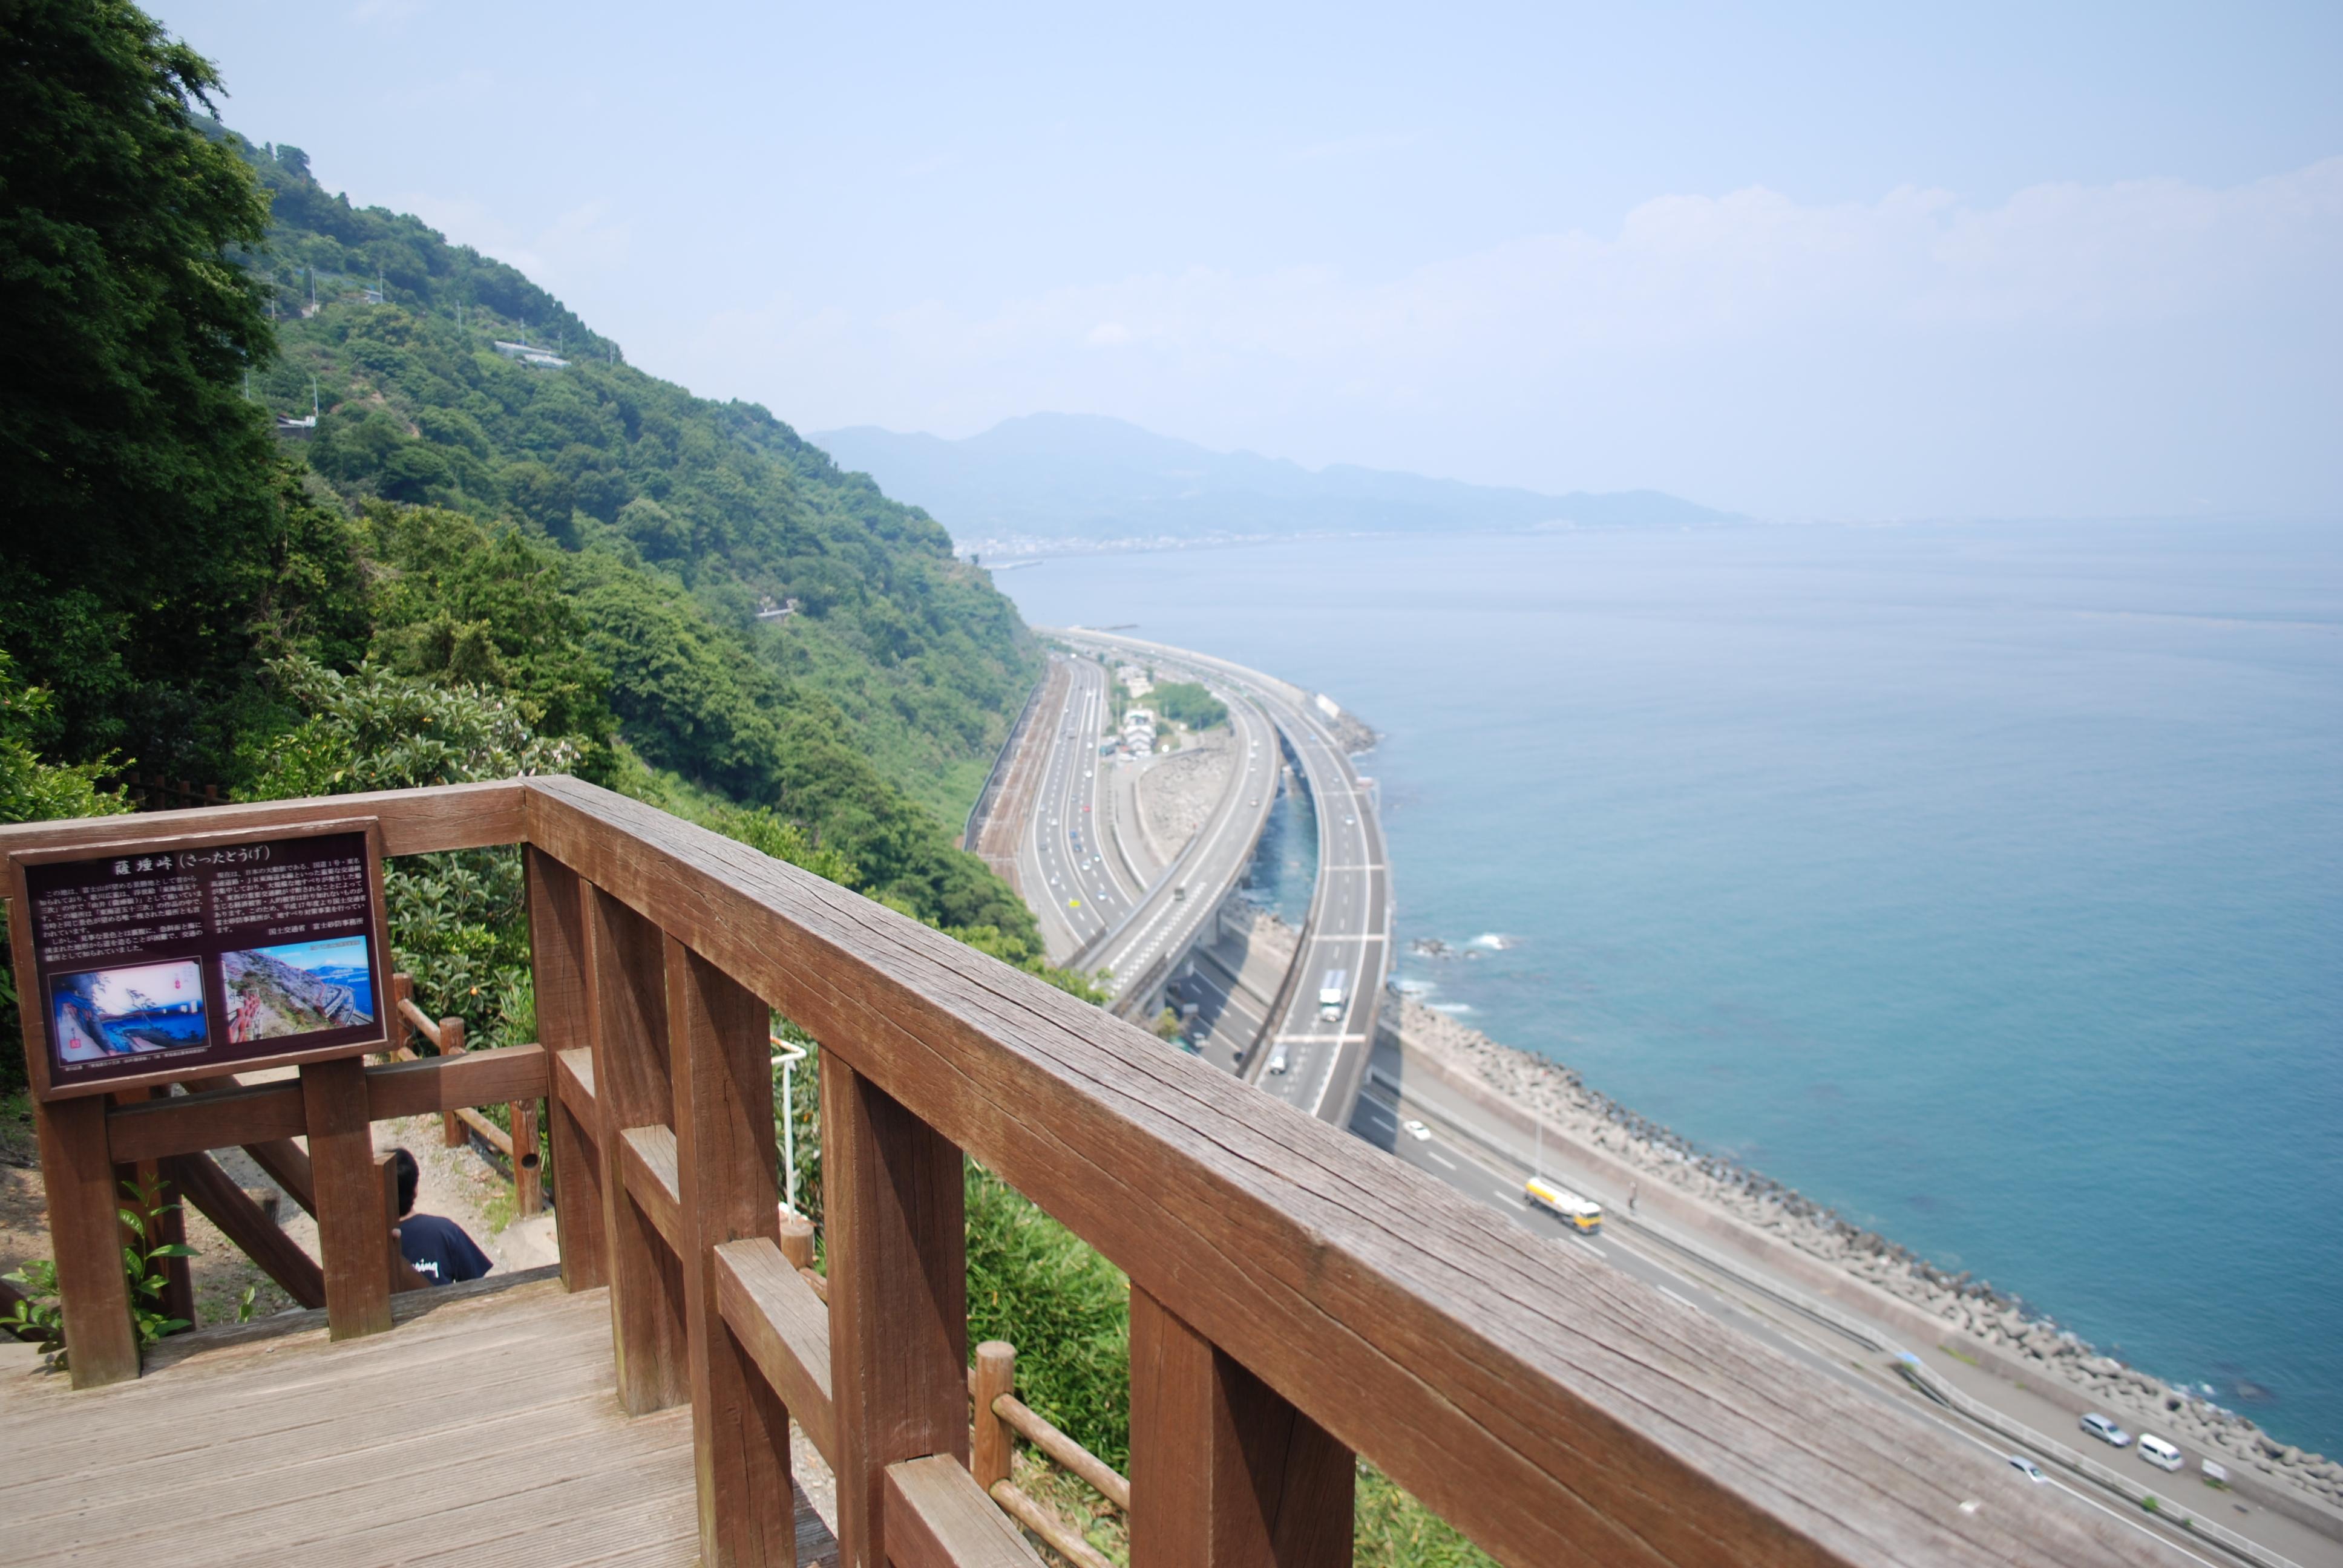 Shizuoka Japan  city photos gallery : Description Satta pass,Yui,Shizuoka city,Japan